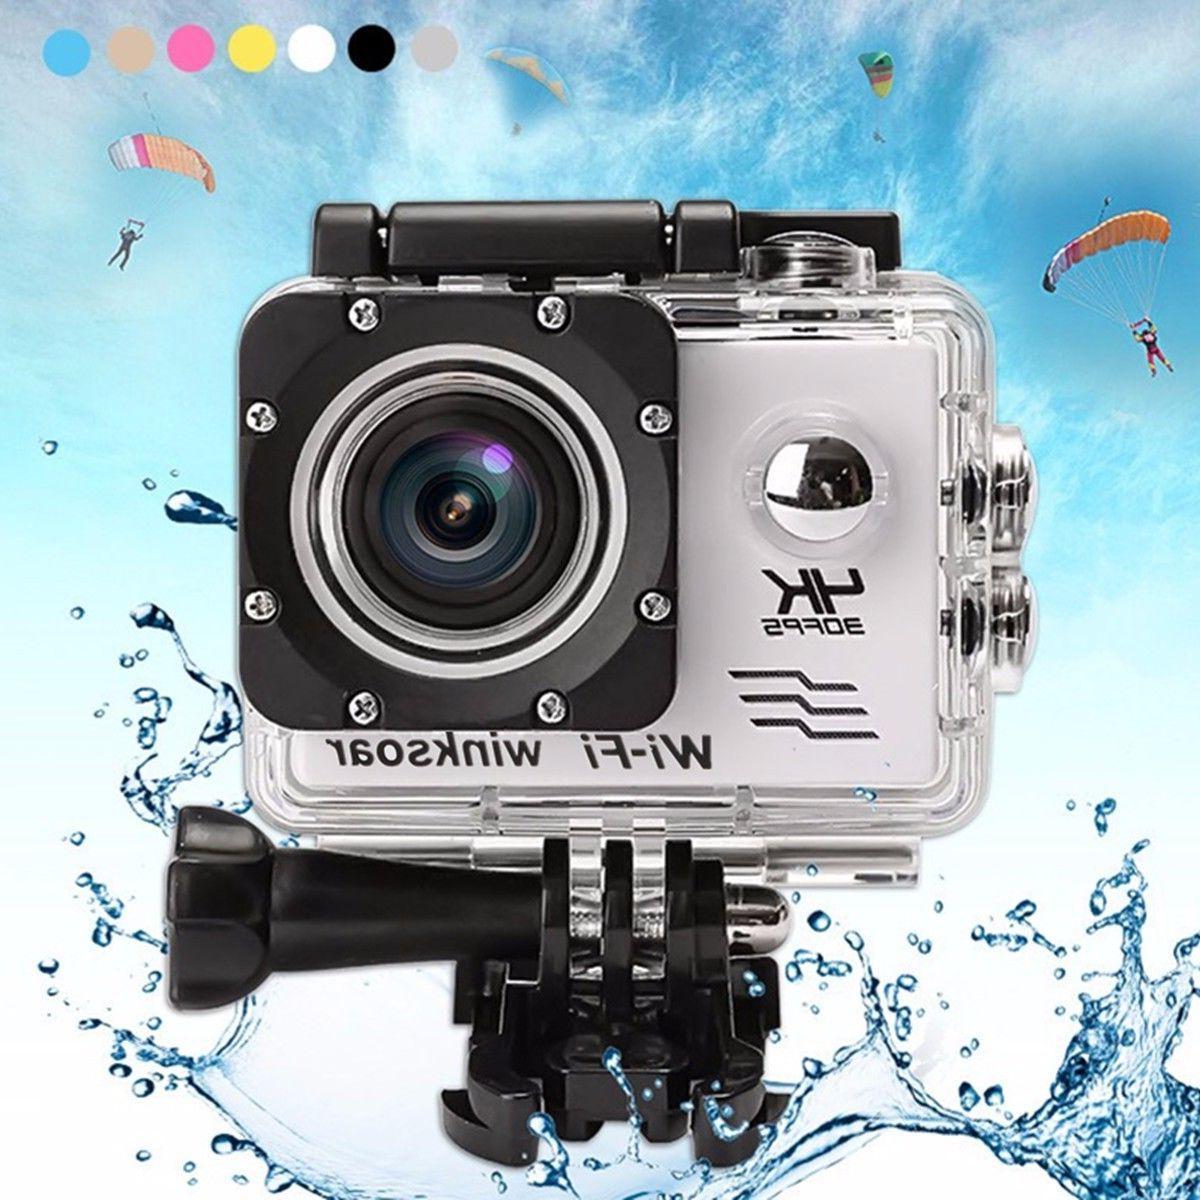 Waterproof Wifi 1080P Action Camcorder